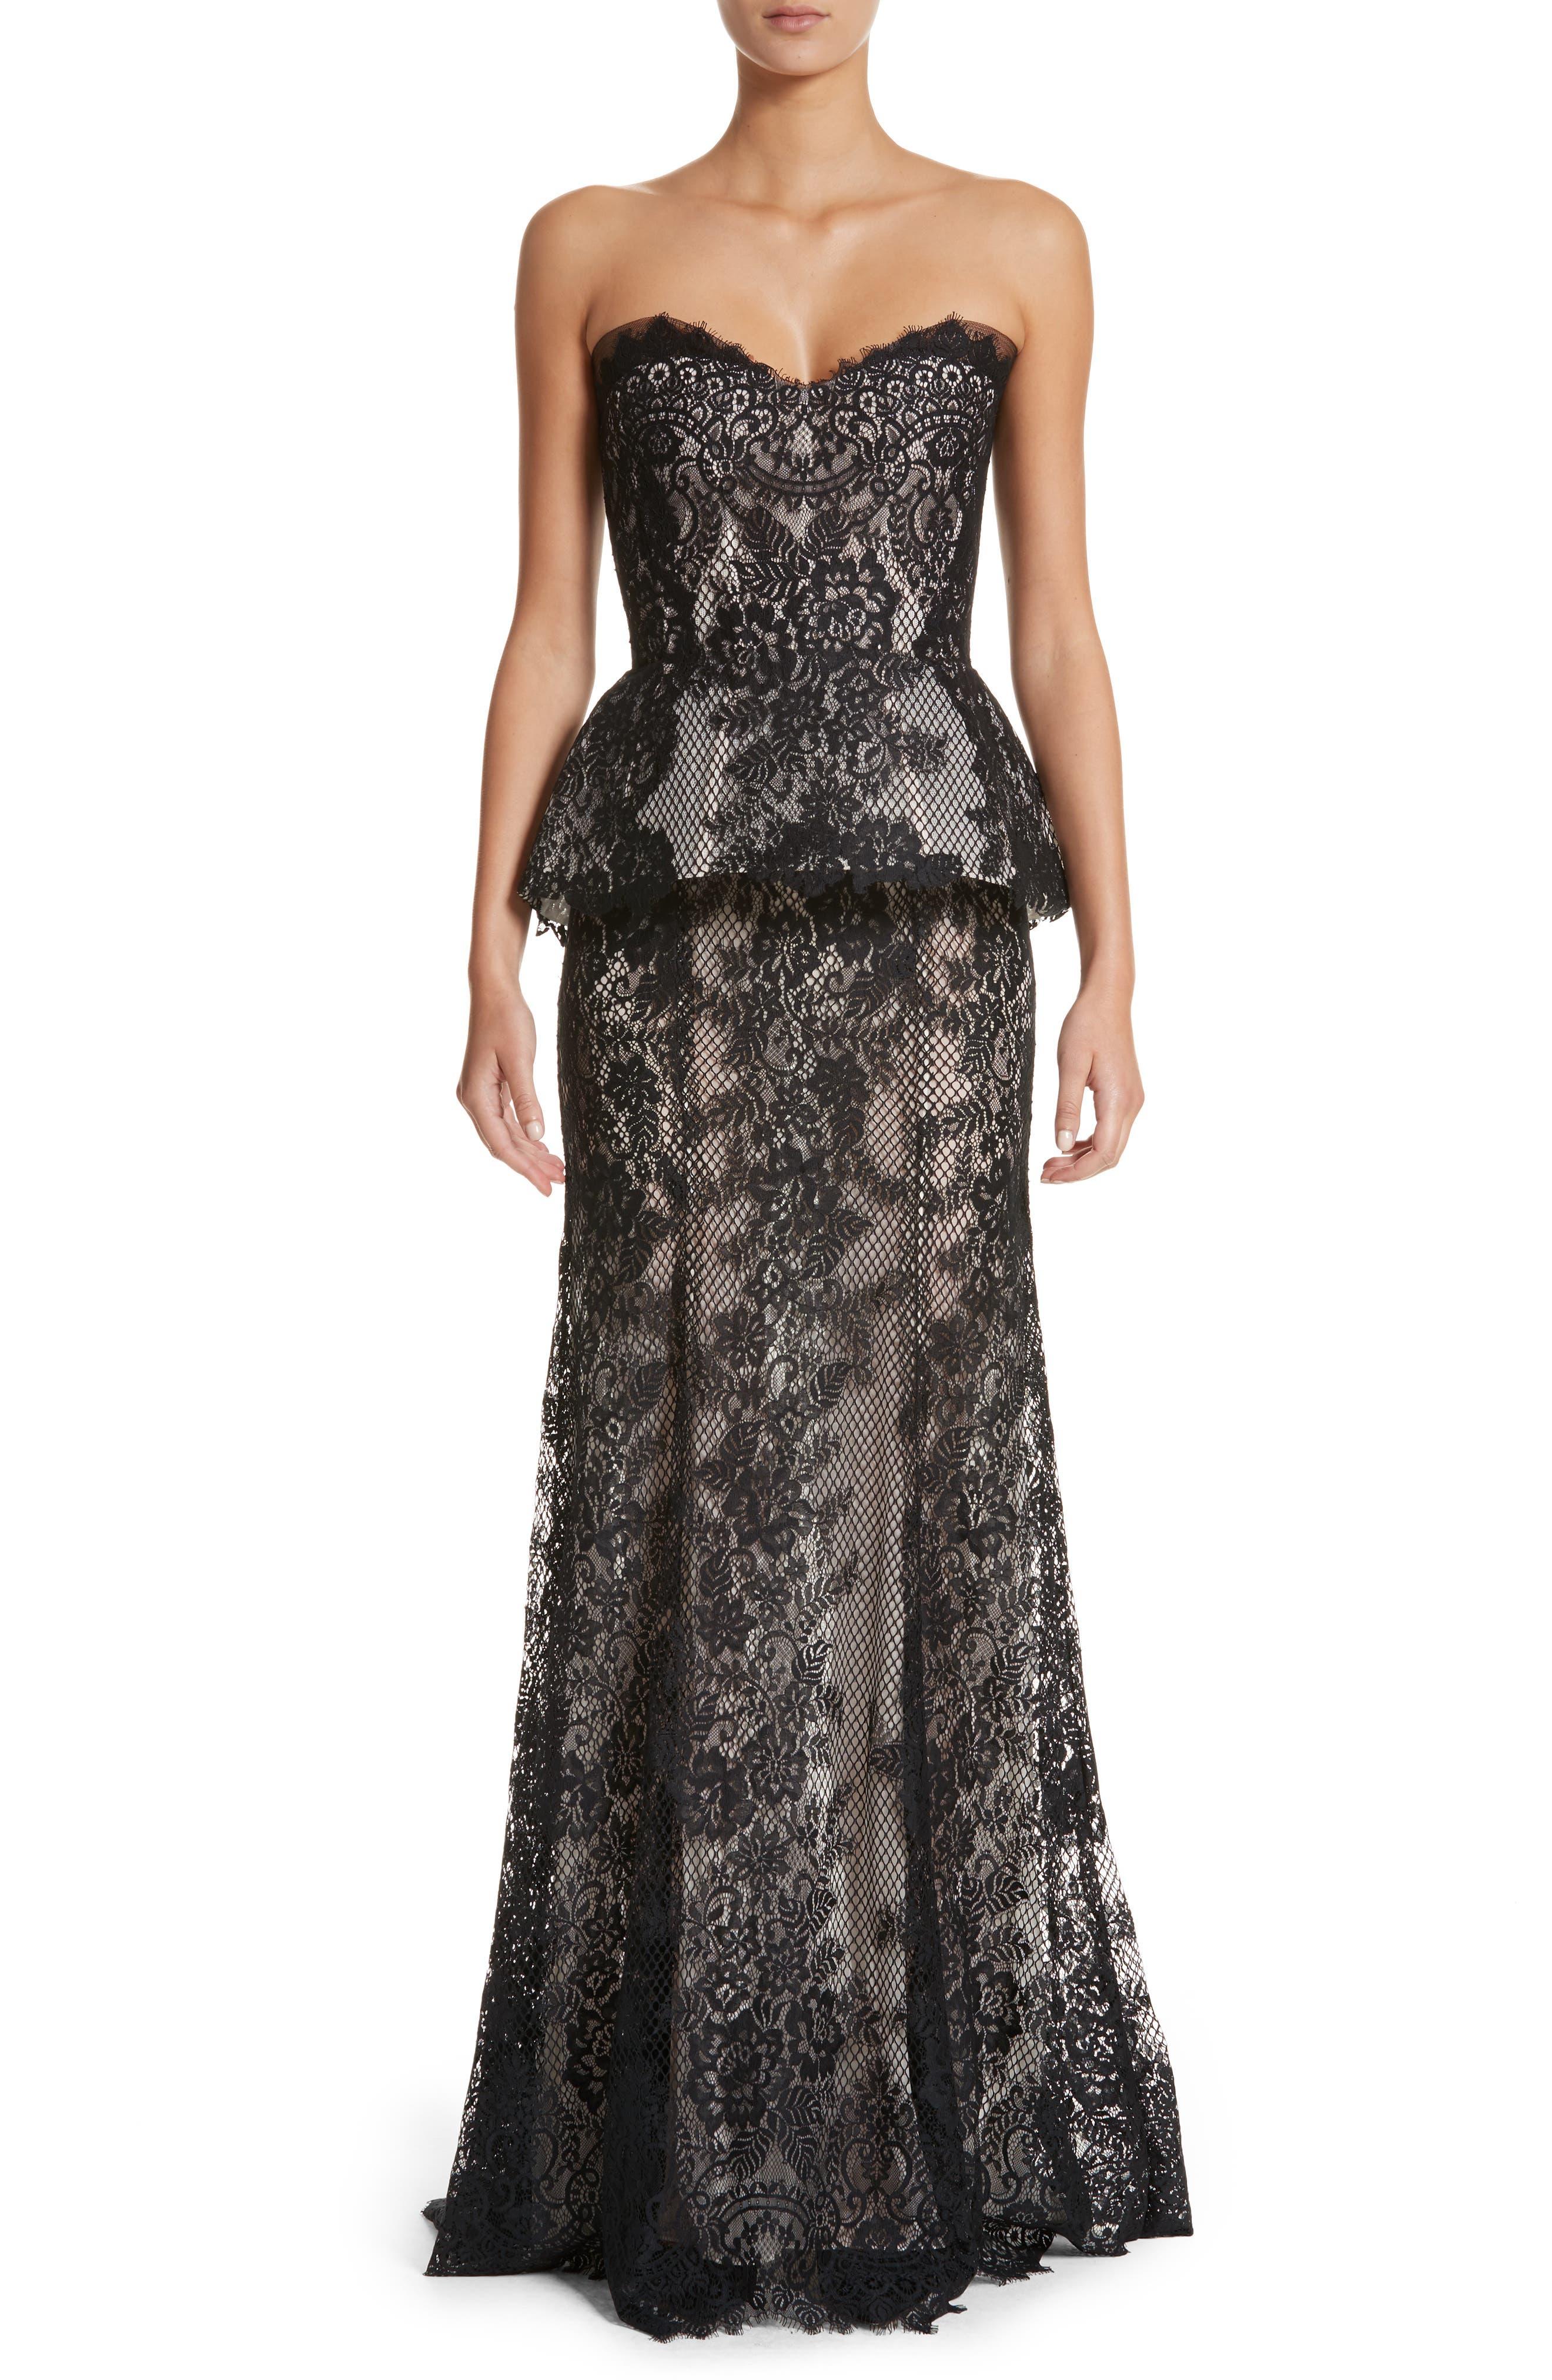 Alternate Image 1 Selected - Monique Lhuillier Strapless Peplum Lace Gown